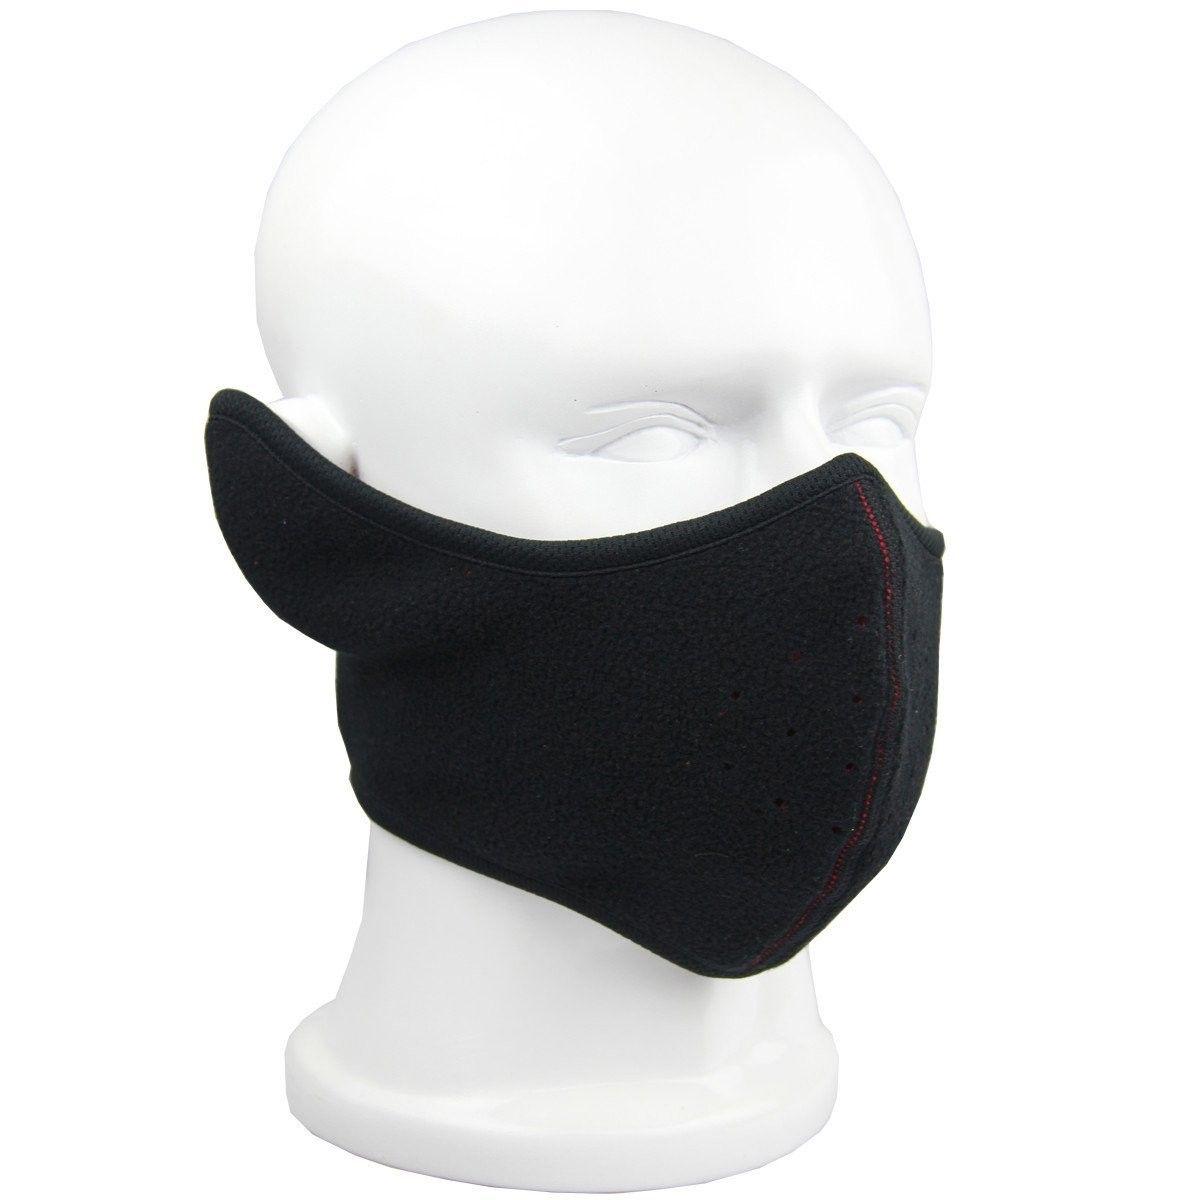 Reversible Fleece Ear Nose Warmer Half Face Mask Facemask Facial Mask -  Black - CV11QSUHLL9 - Hats   Caps c41f7f31acf7